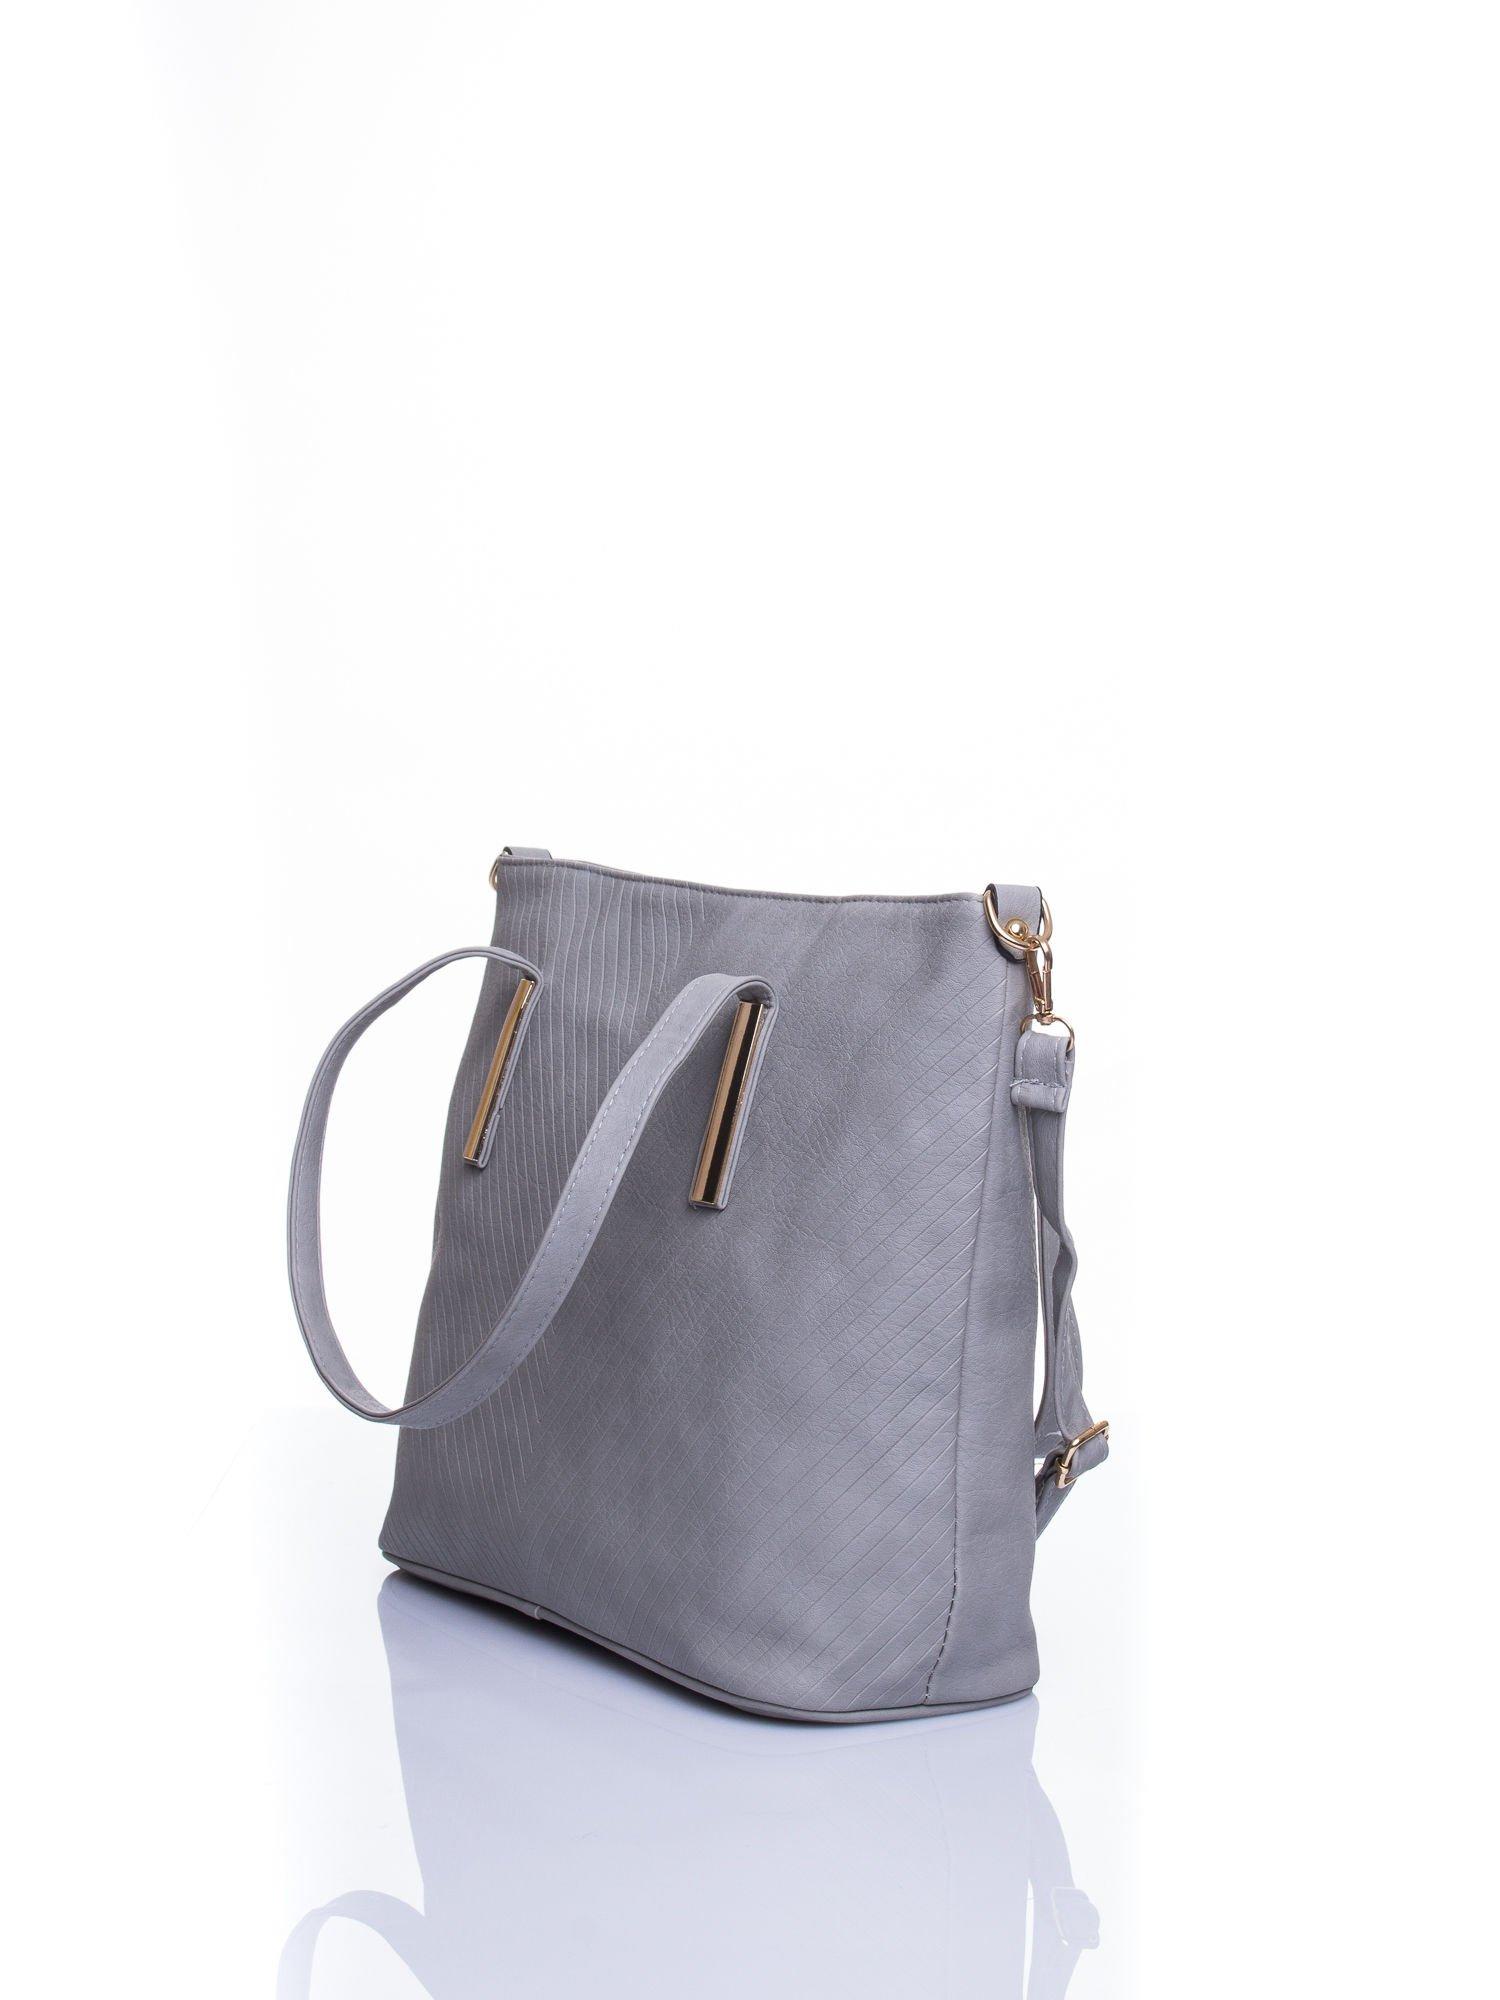 Szara fakturowana torba shopper bag                                  zdj.                                  4